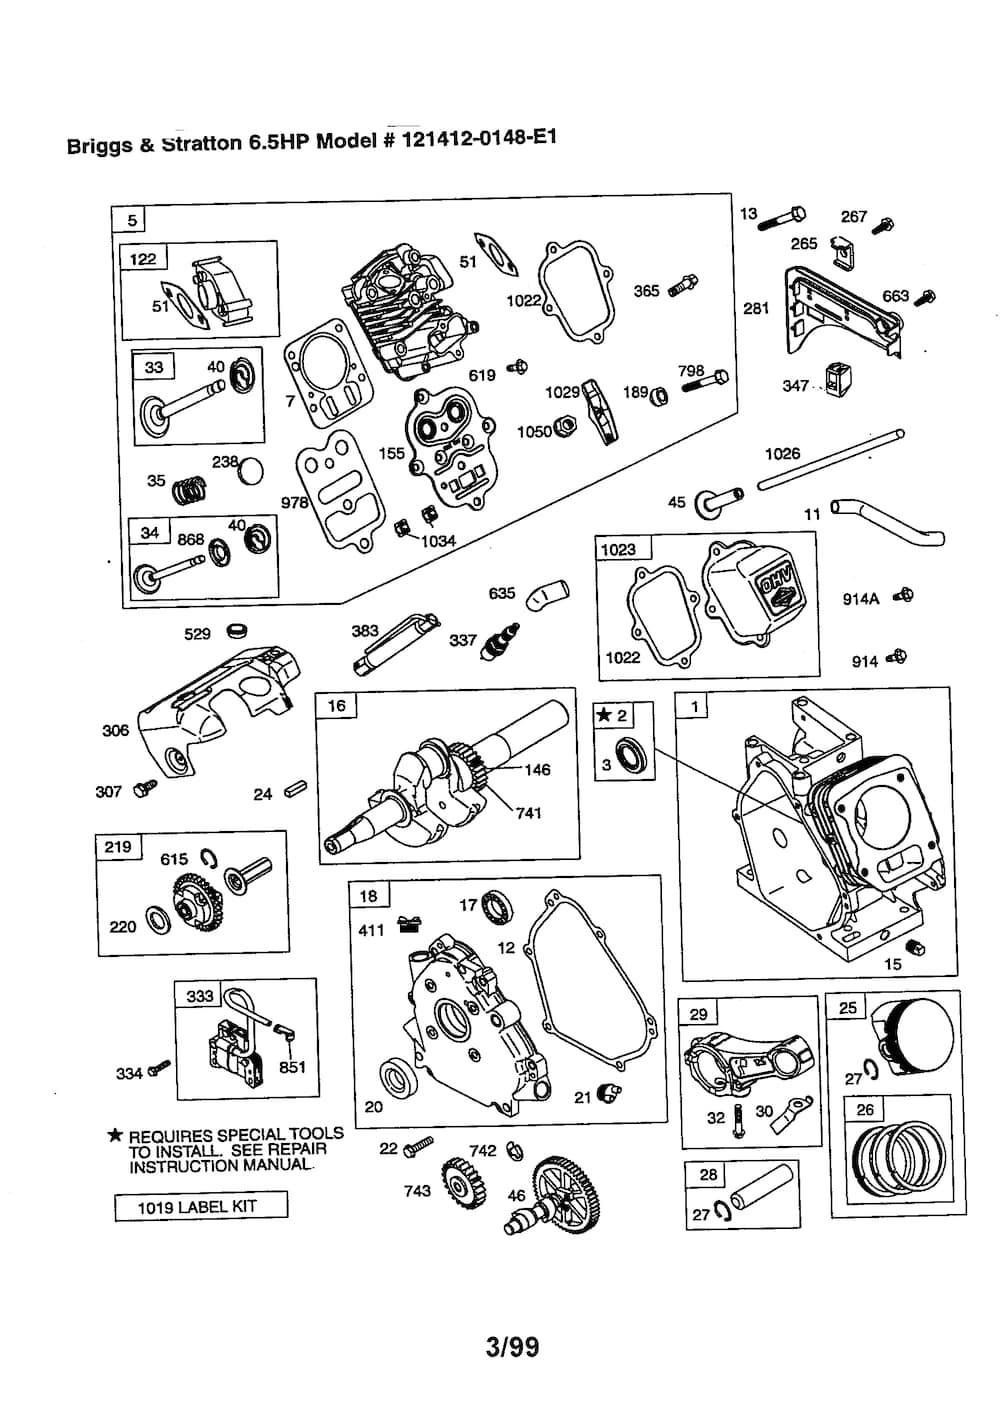 6.5 Briggs Stratton Carburetor Diagram Briggs & Stratton 6 5 Hp Engine Parts Model E1 Of 6.5 Briggs Stratton Carburetor Diagram